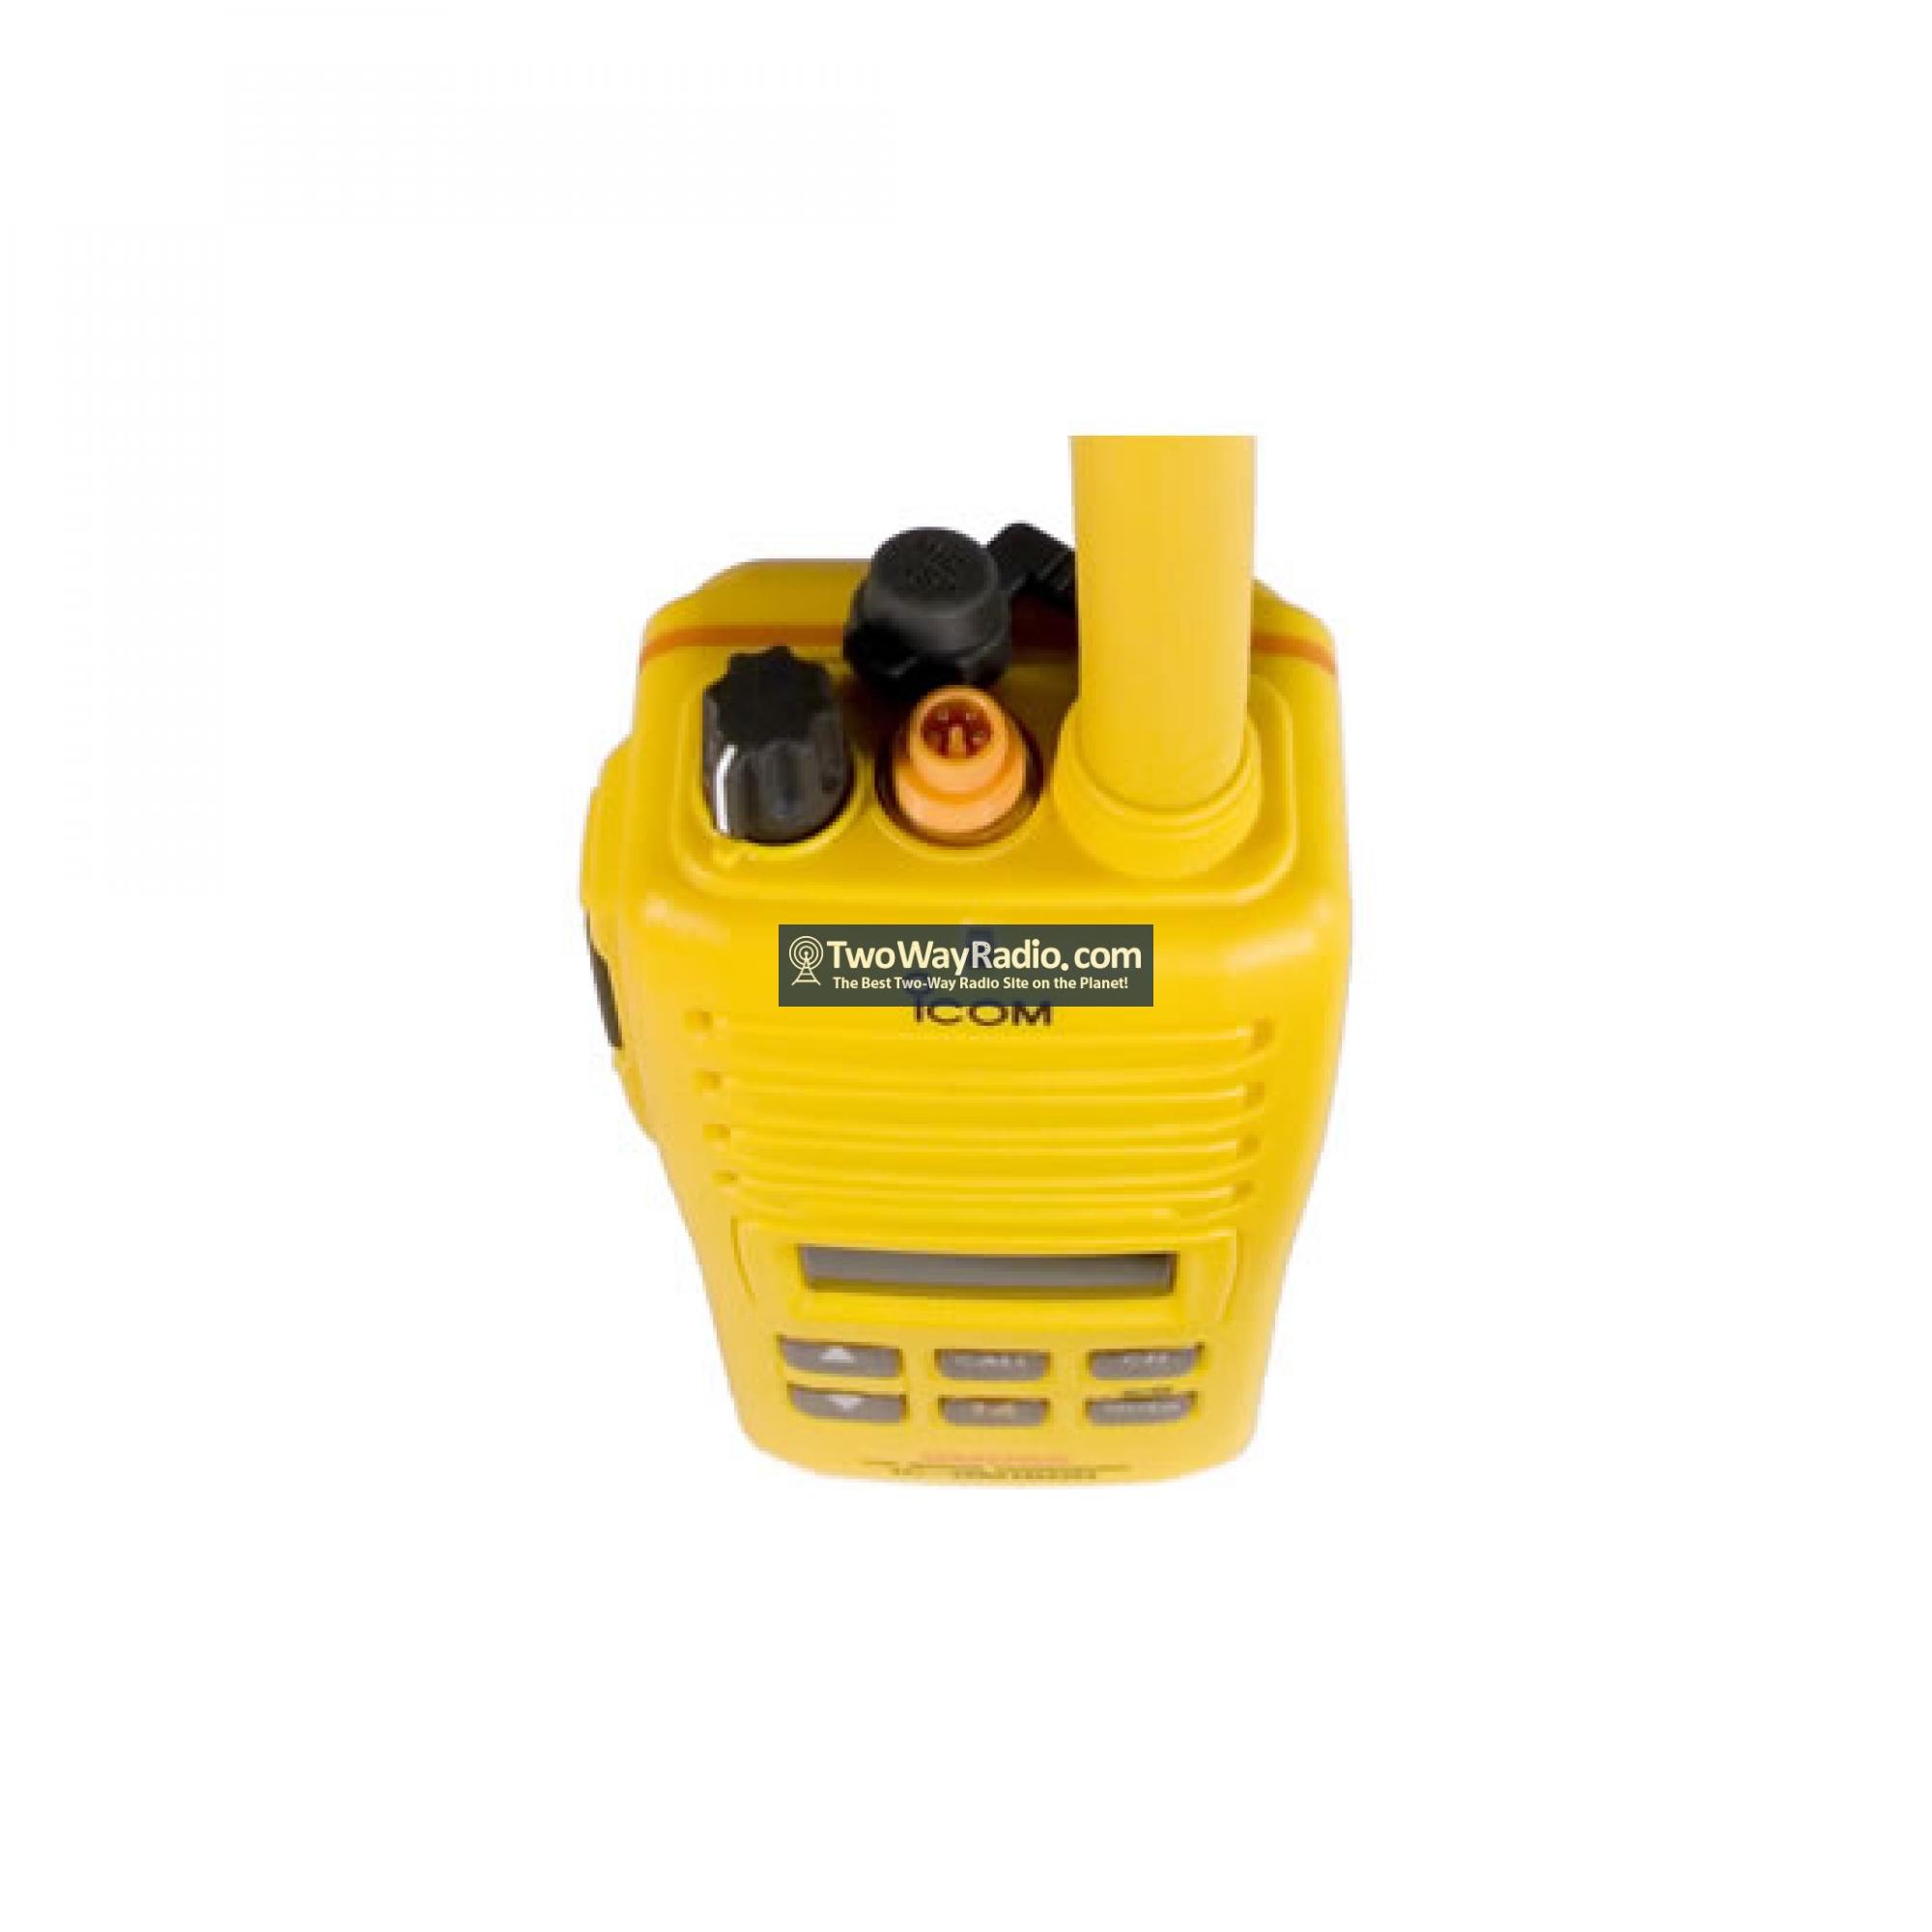 Buy Here | Icom Survival Craft GM1600 21K Marine Radio - 2W, GMDSS